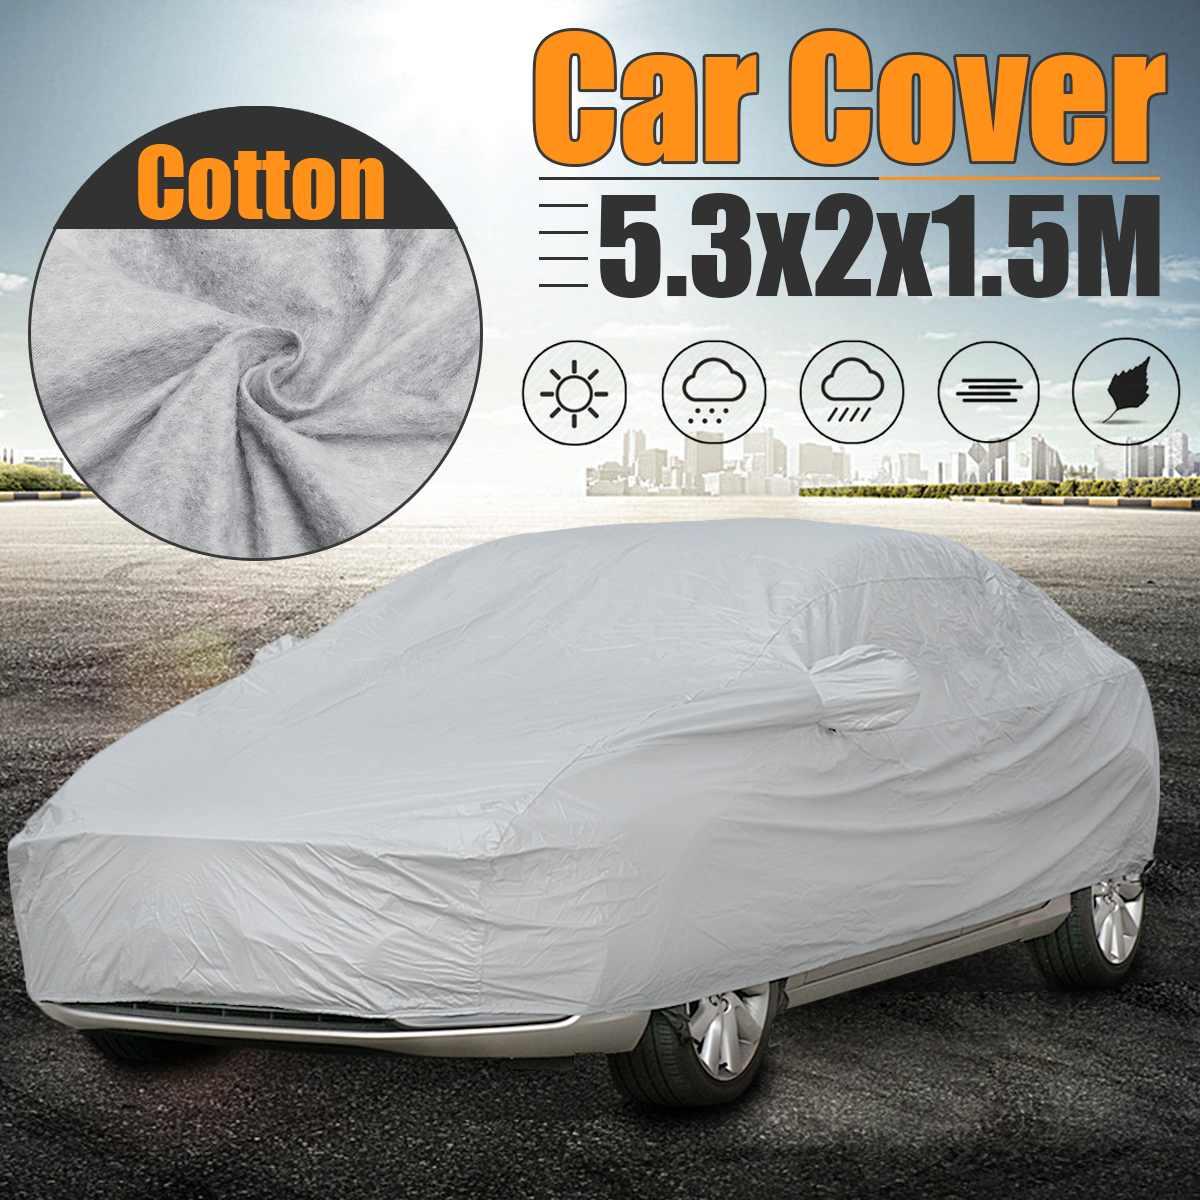 M/L/XL/XXL Full Car Cover Sunshade Sun Visor Protector Auto Ice Frost Resist Waterproof Dustproof Covers